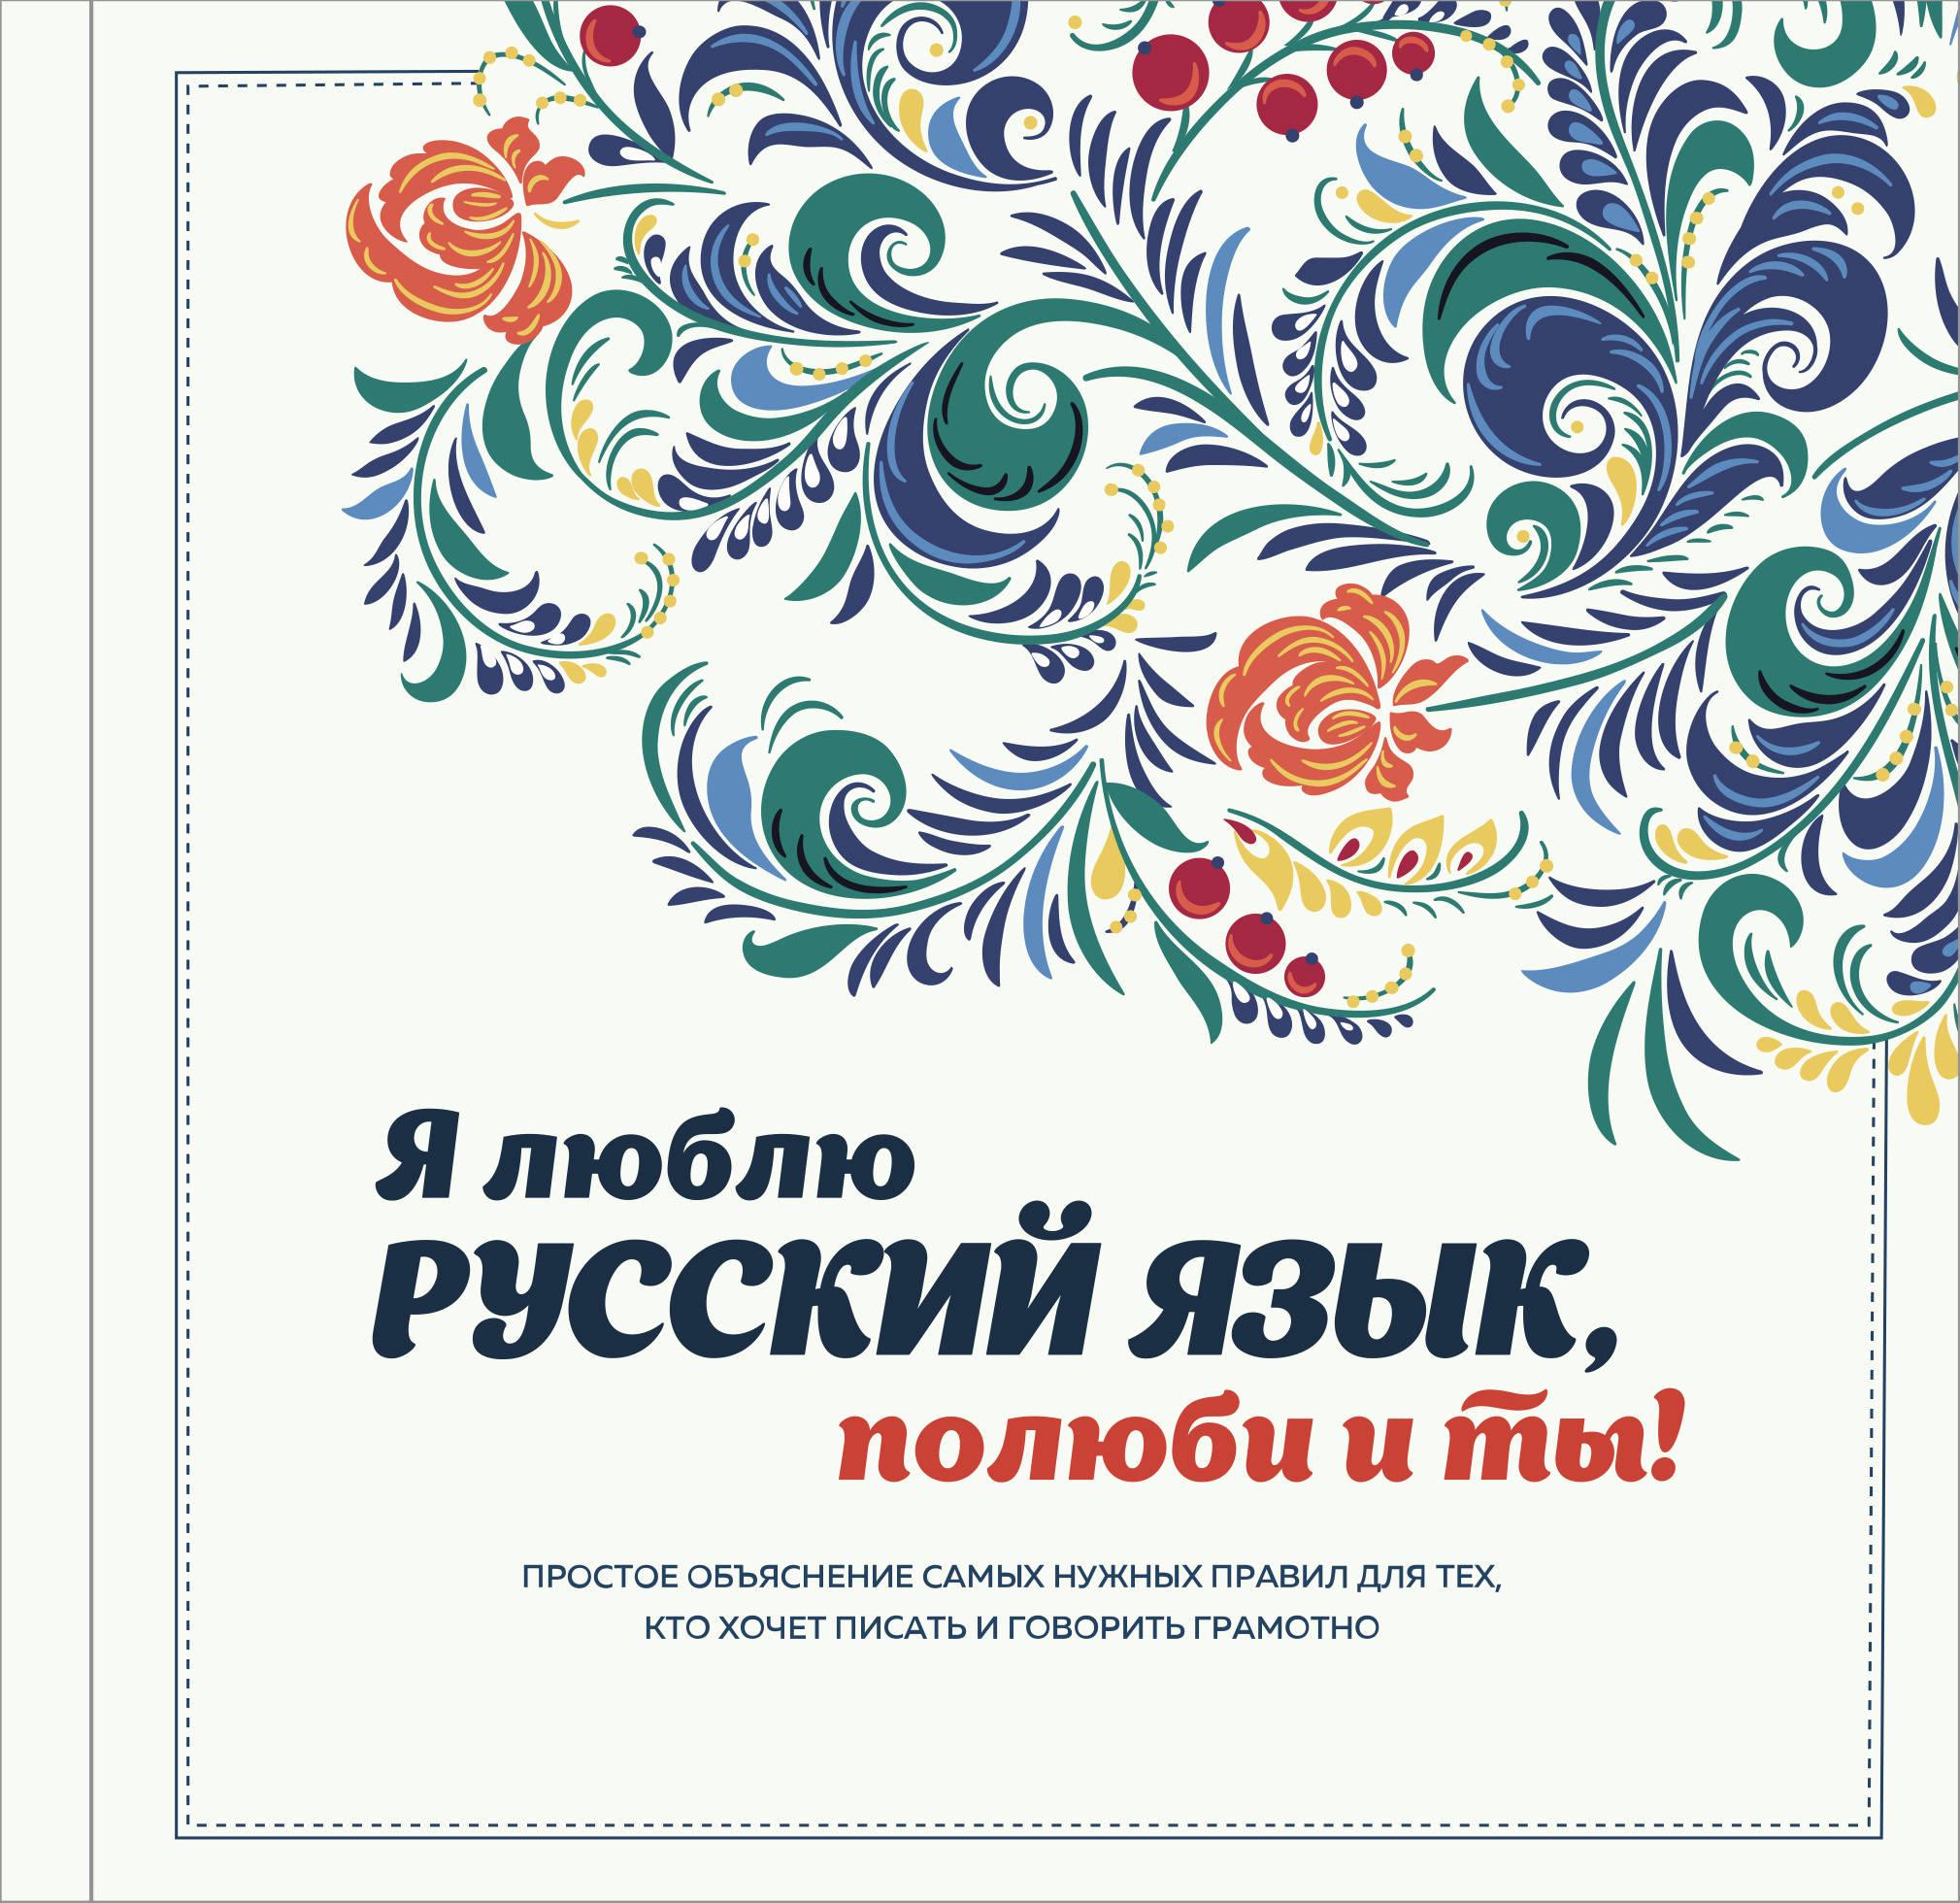 Ja ljublju russkij jazyk, poljubi i ty!